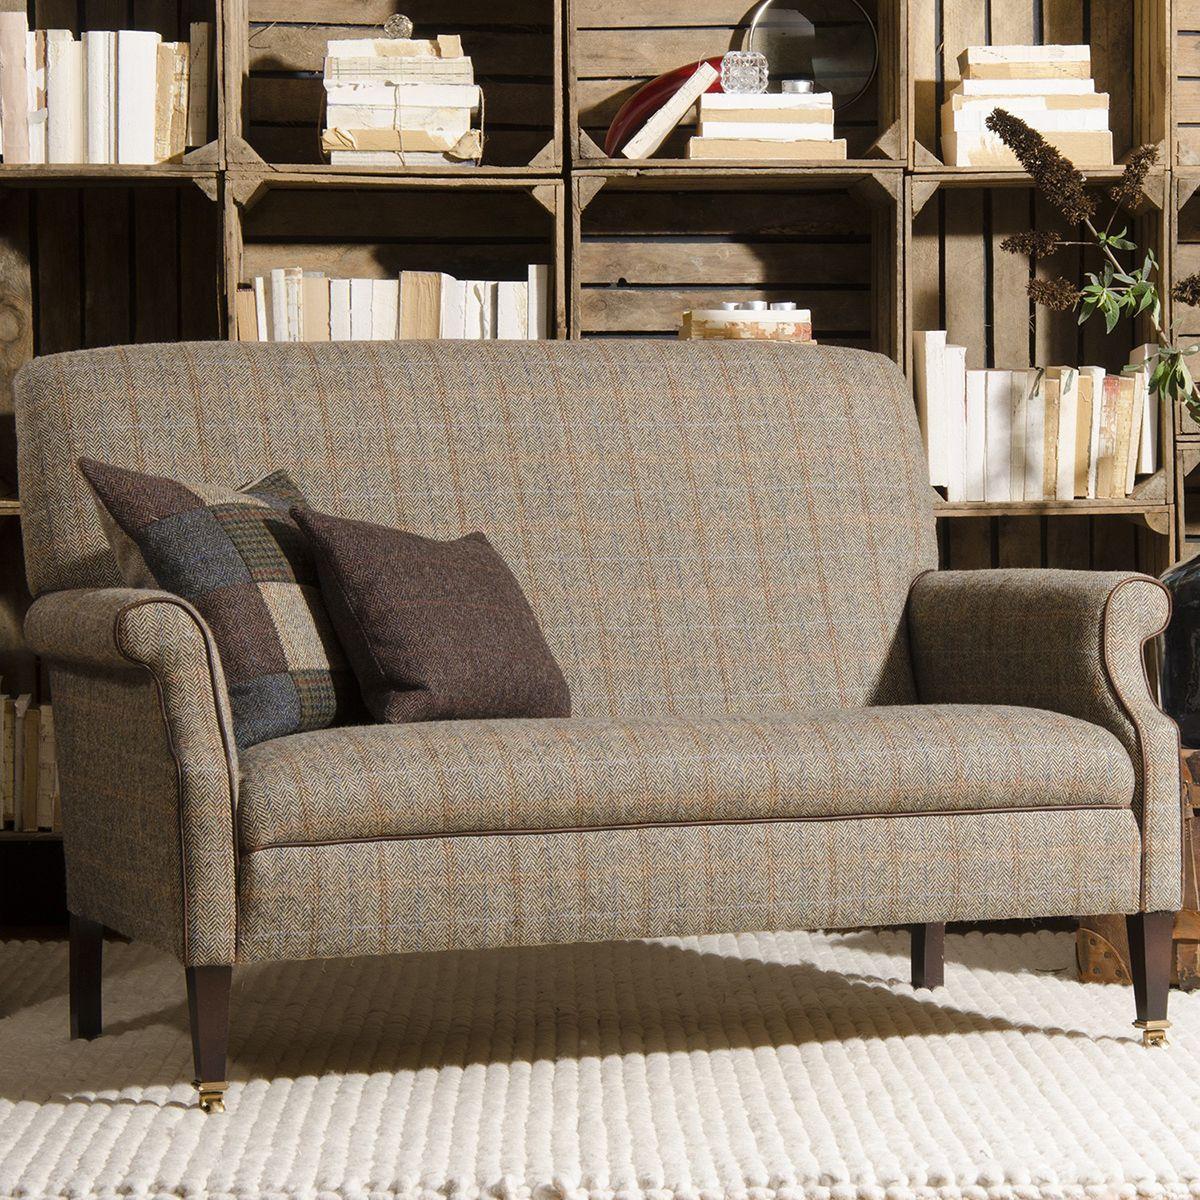 harris tweed bowmore midi sofa corner ikea ebay tetrad compact small sofas living homes